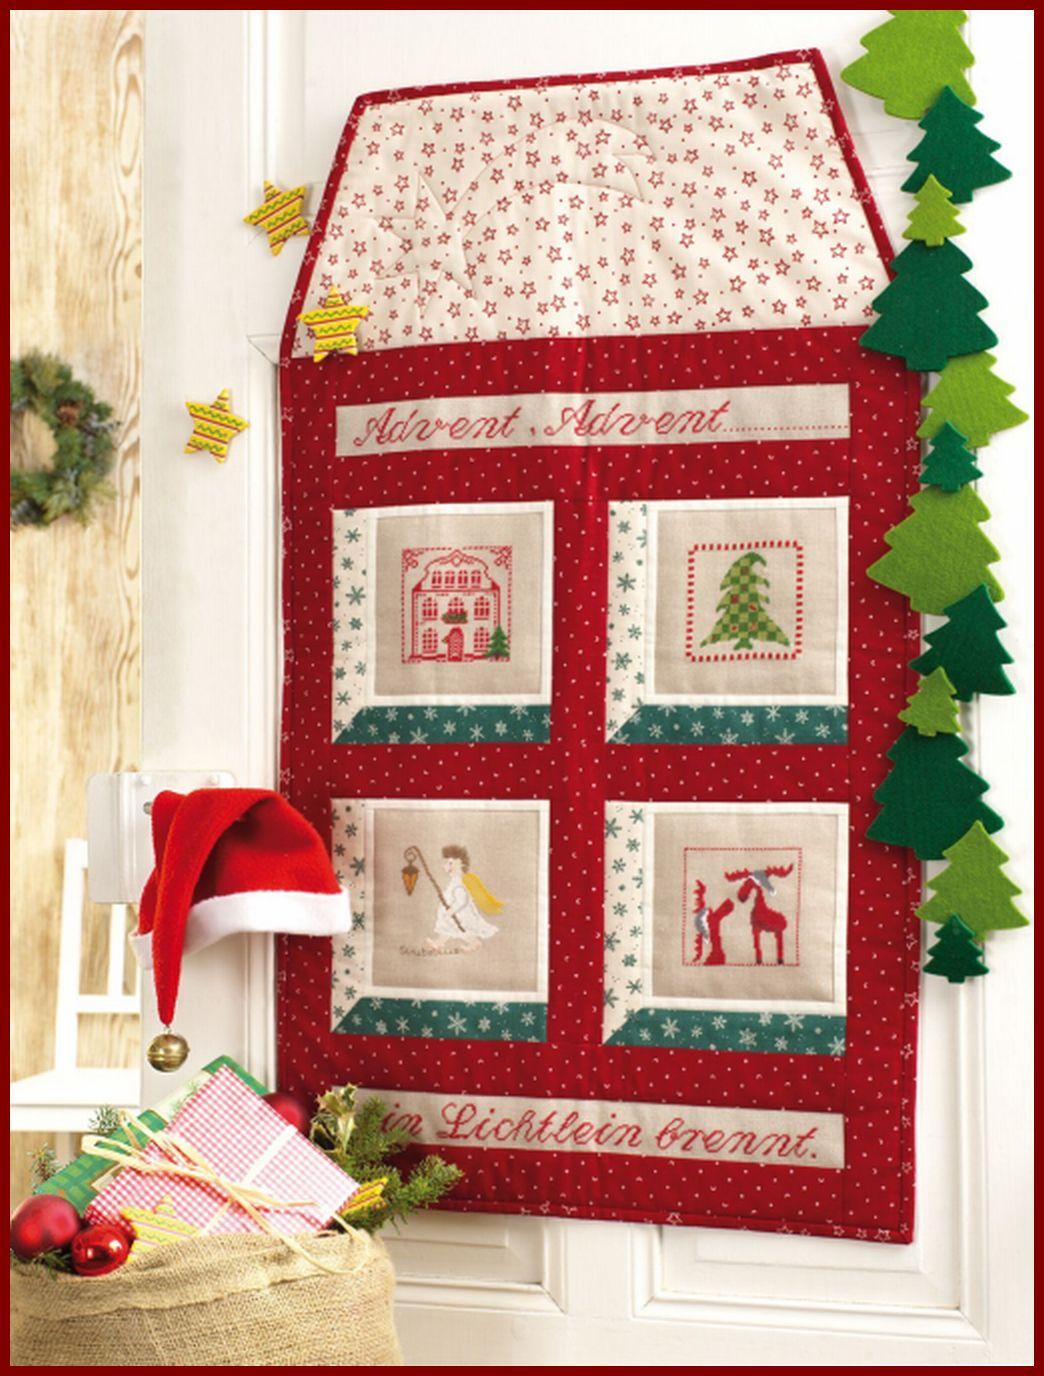 ulrike feret stickkunst sticken mit patchwork. Black Bedroom Furniture Sets. Home Design Ideas